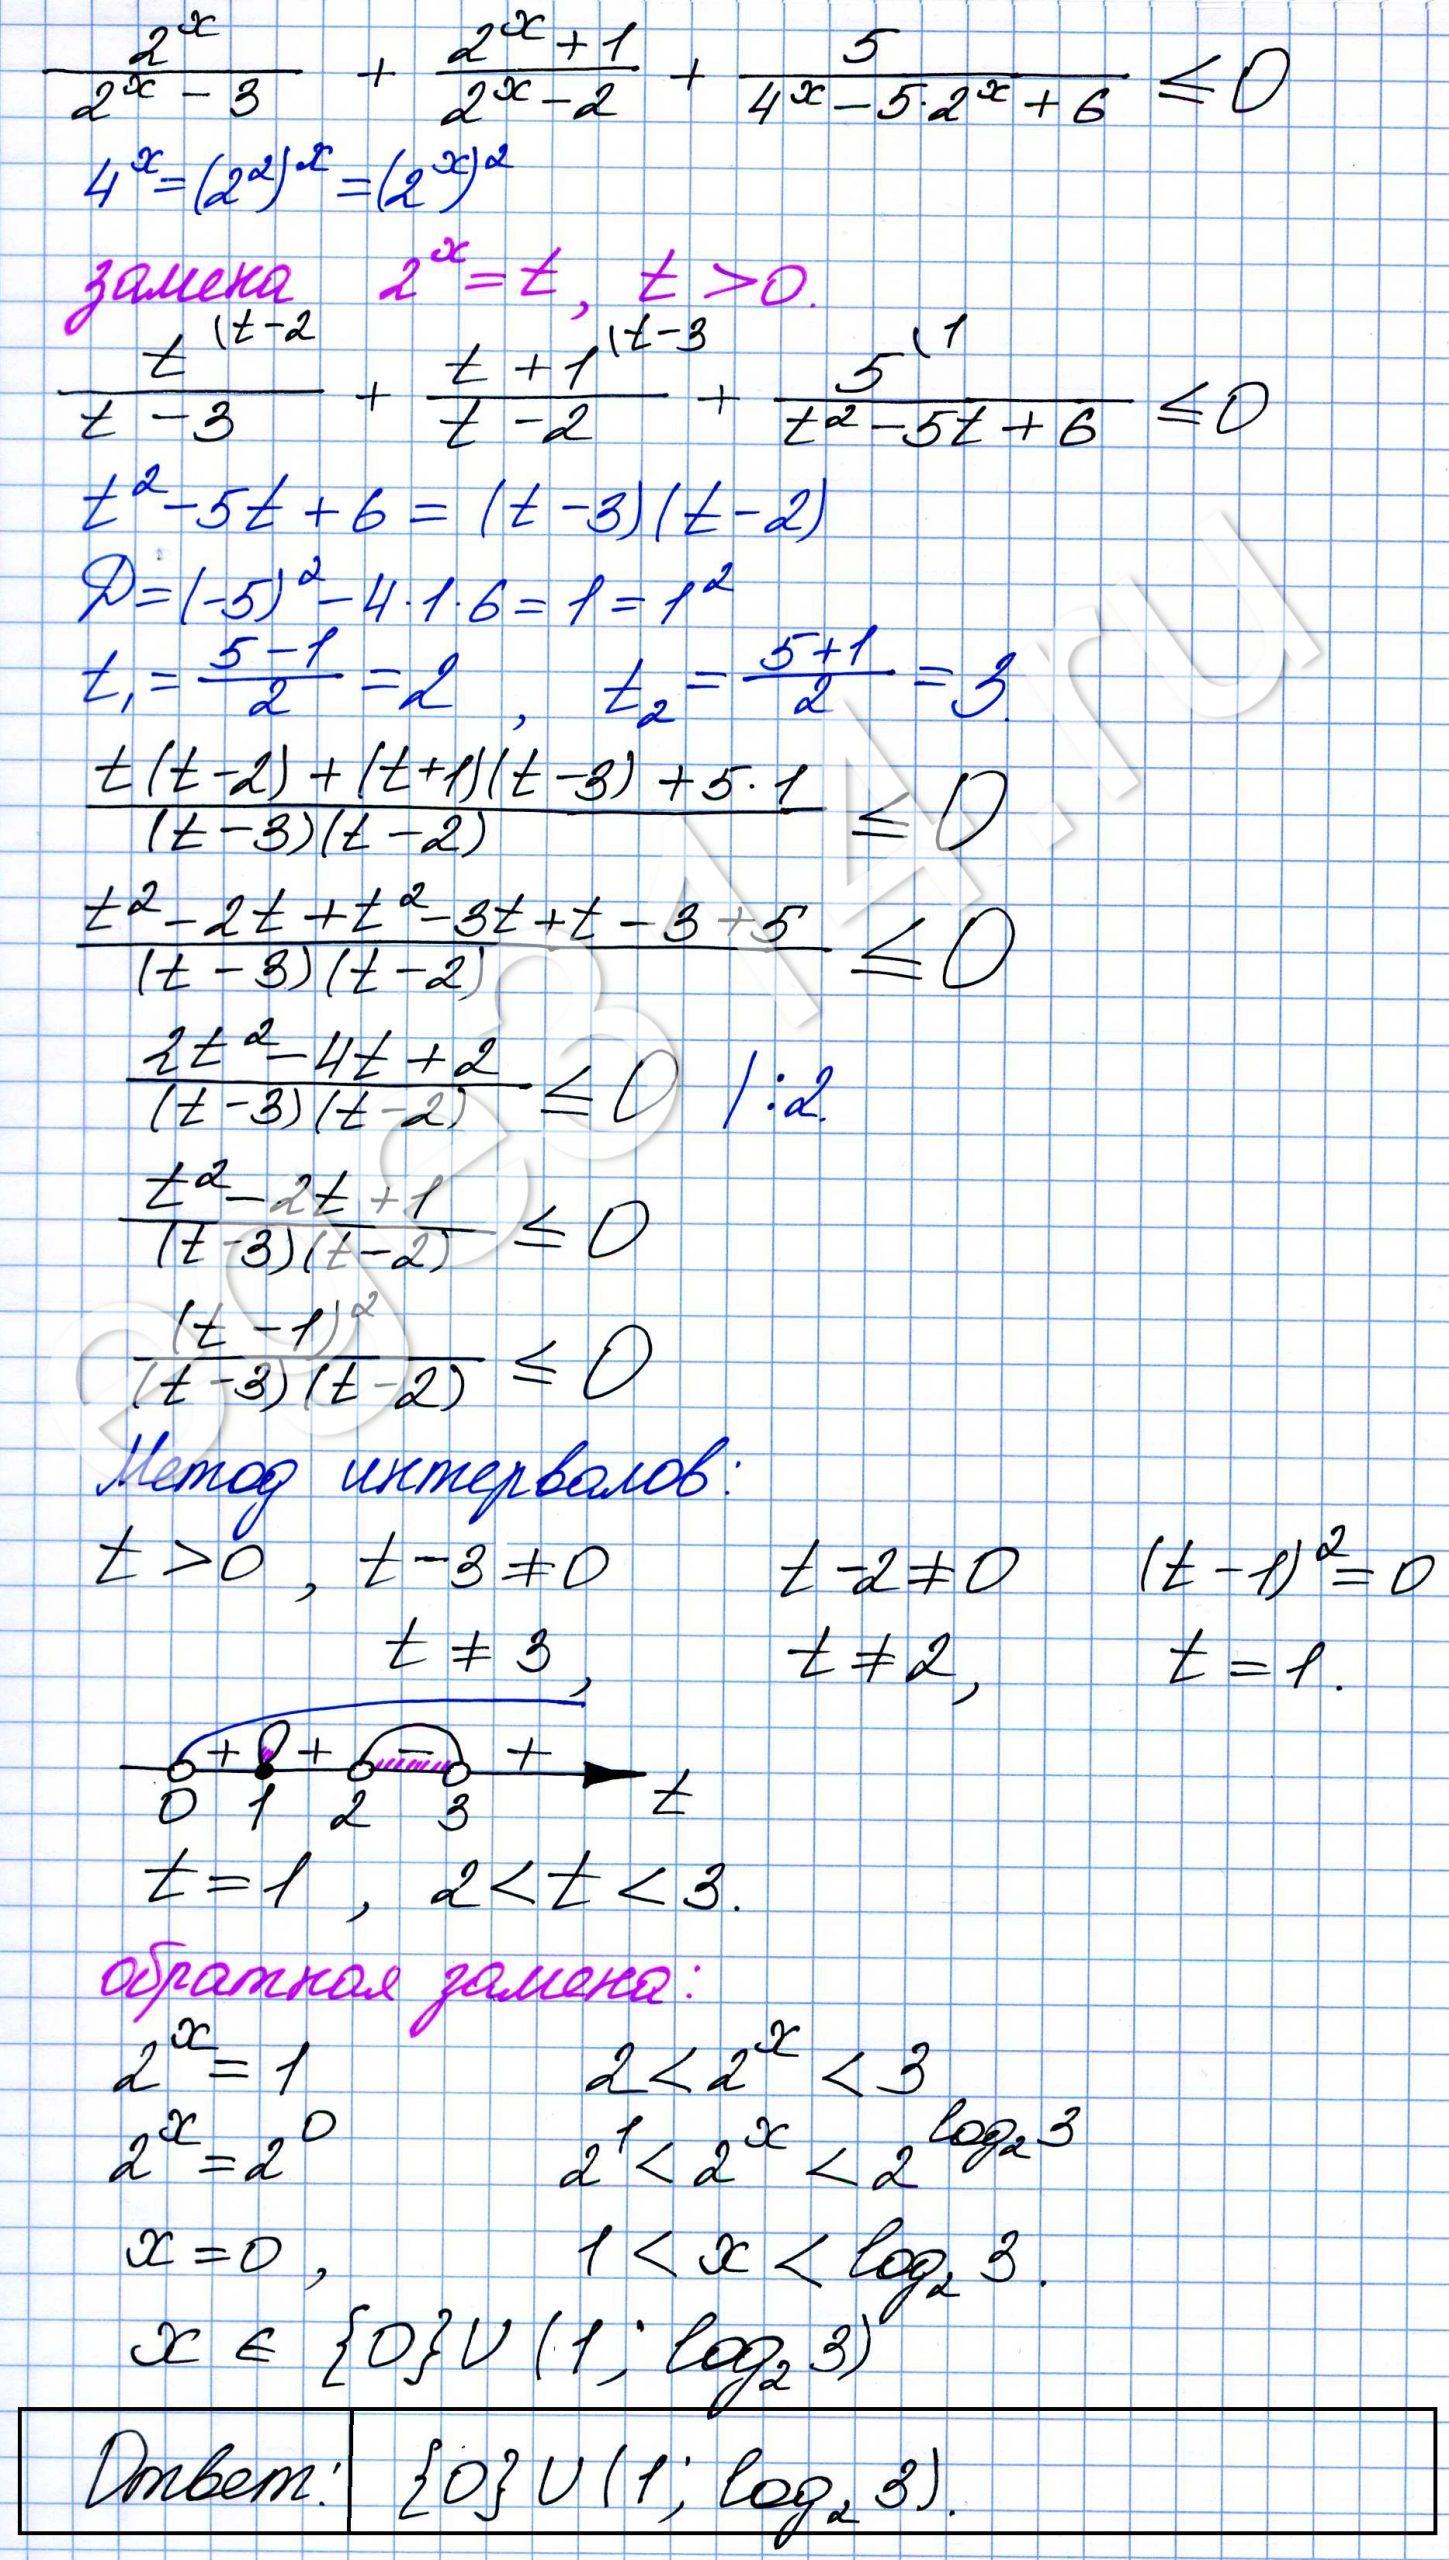 Решите неравенство 2^𝑥(2^𝑥−3) + (2^𝑥+1)(2^𝑥−2) + 5(4^𝑥 − 5∙2^𝑥 + 6) ≤ 0